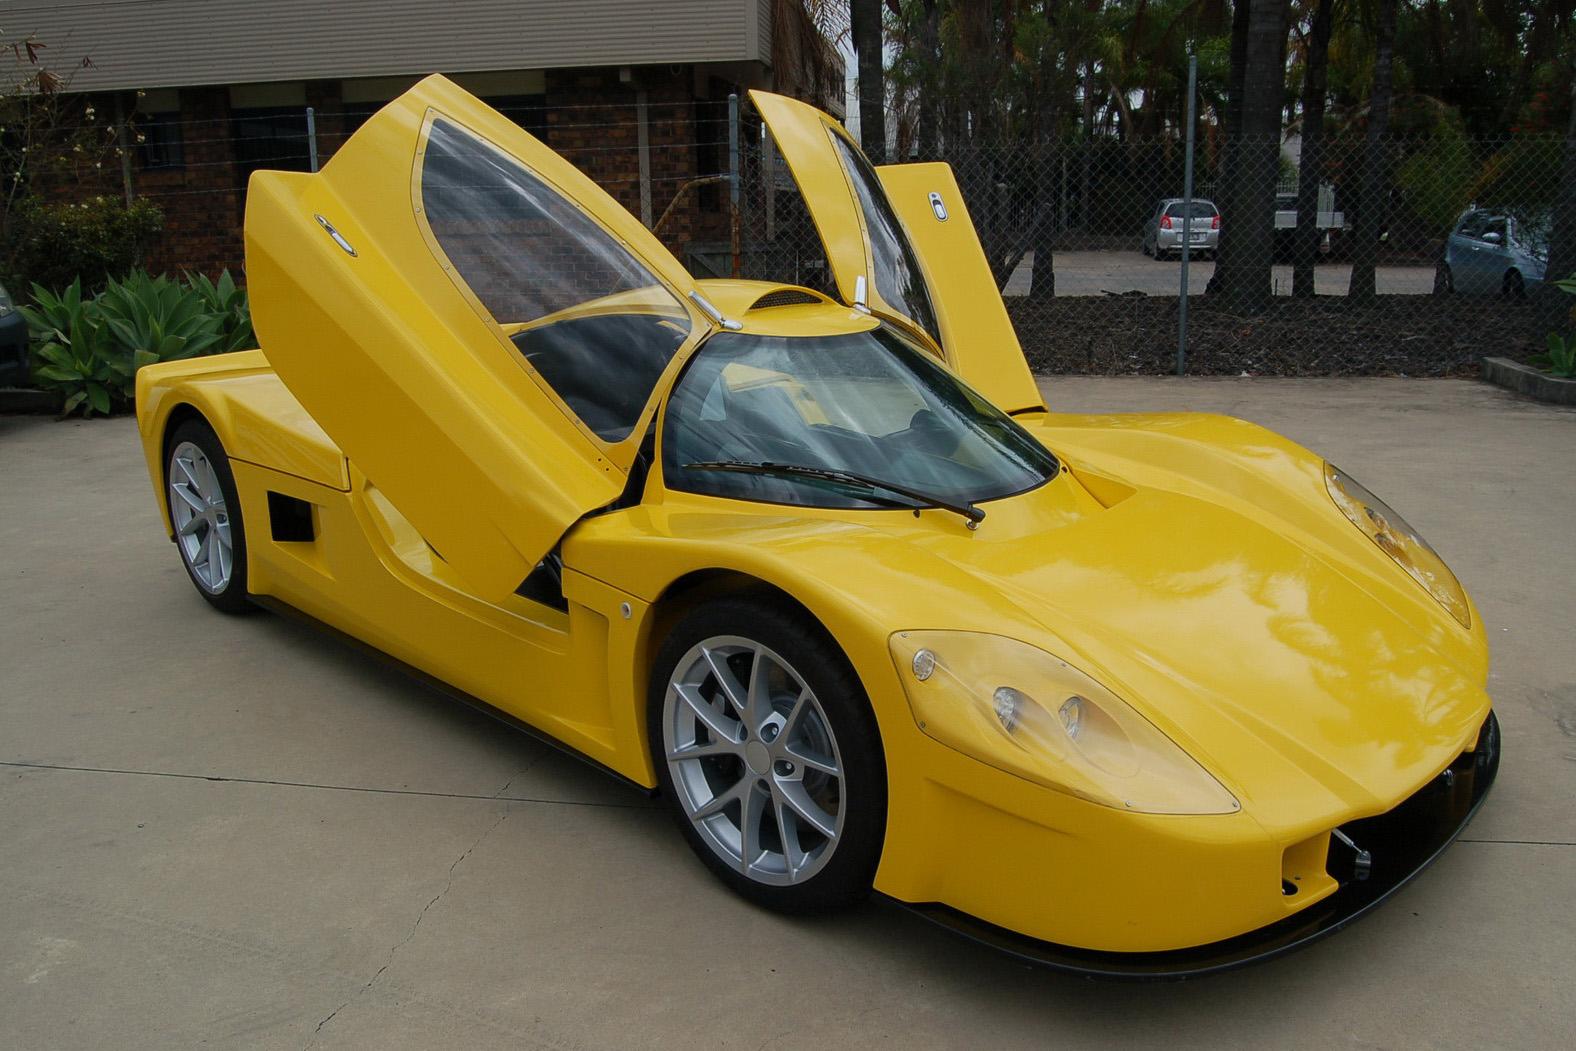 Superlite_SLC_Yellow_frontCorner_zps92e04539.jpg